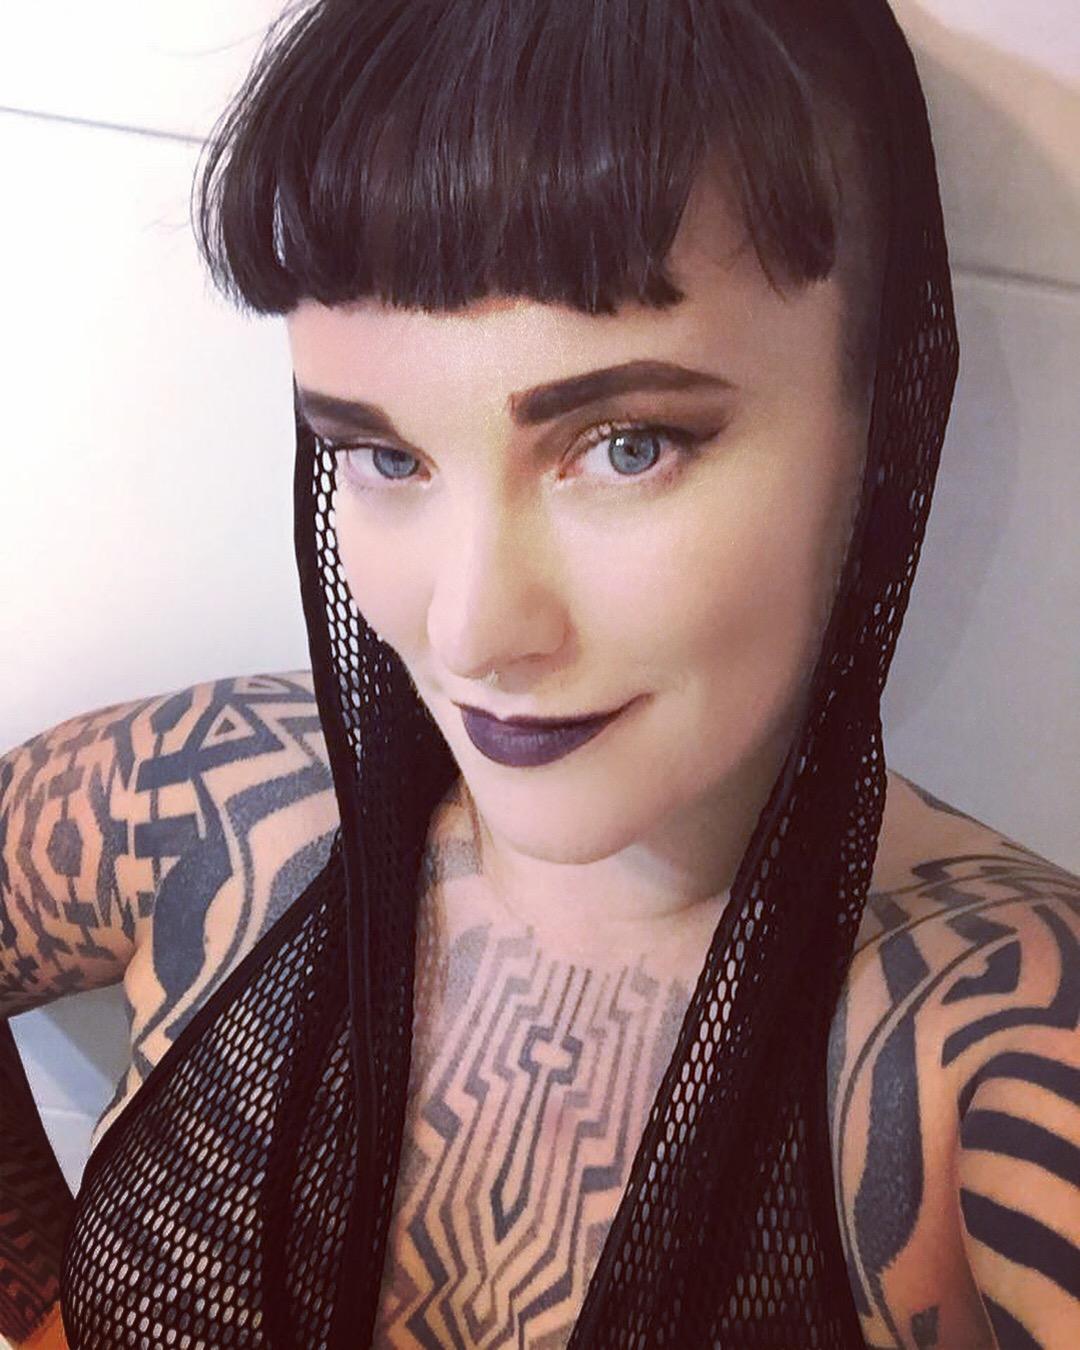 Miss Tallula, Newcastle mistress, Newcastle dominatrix, mesh fetishist, nylon fetishist, tattooed, alternative